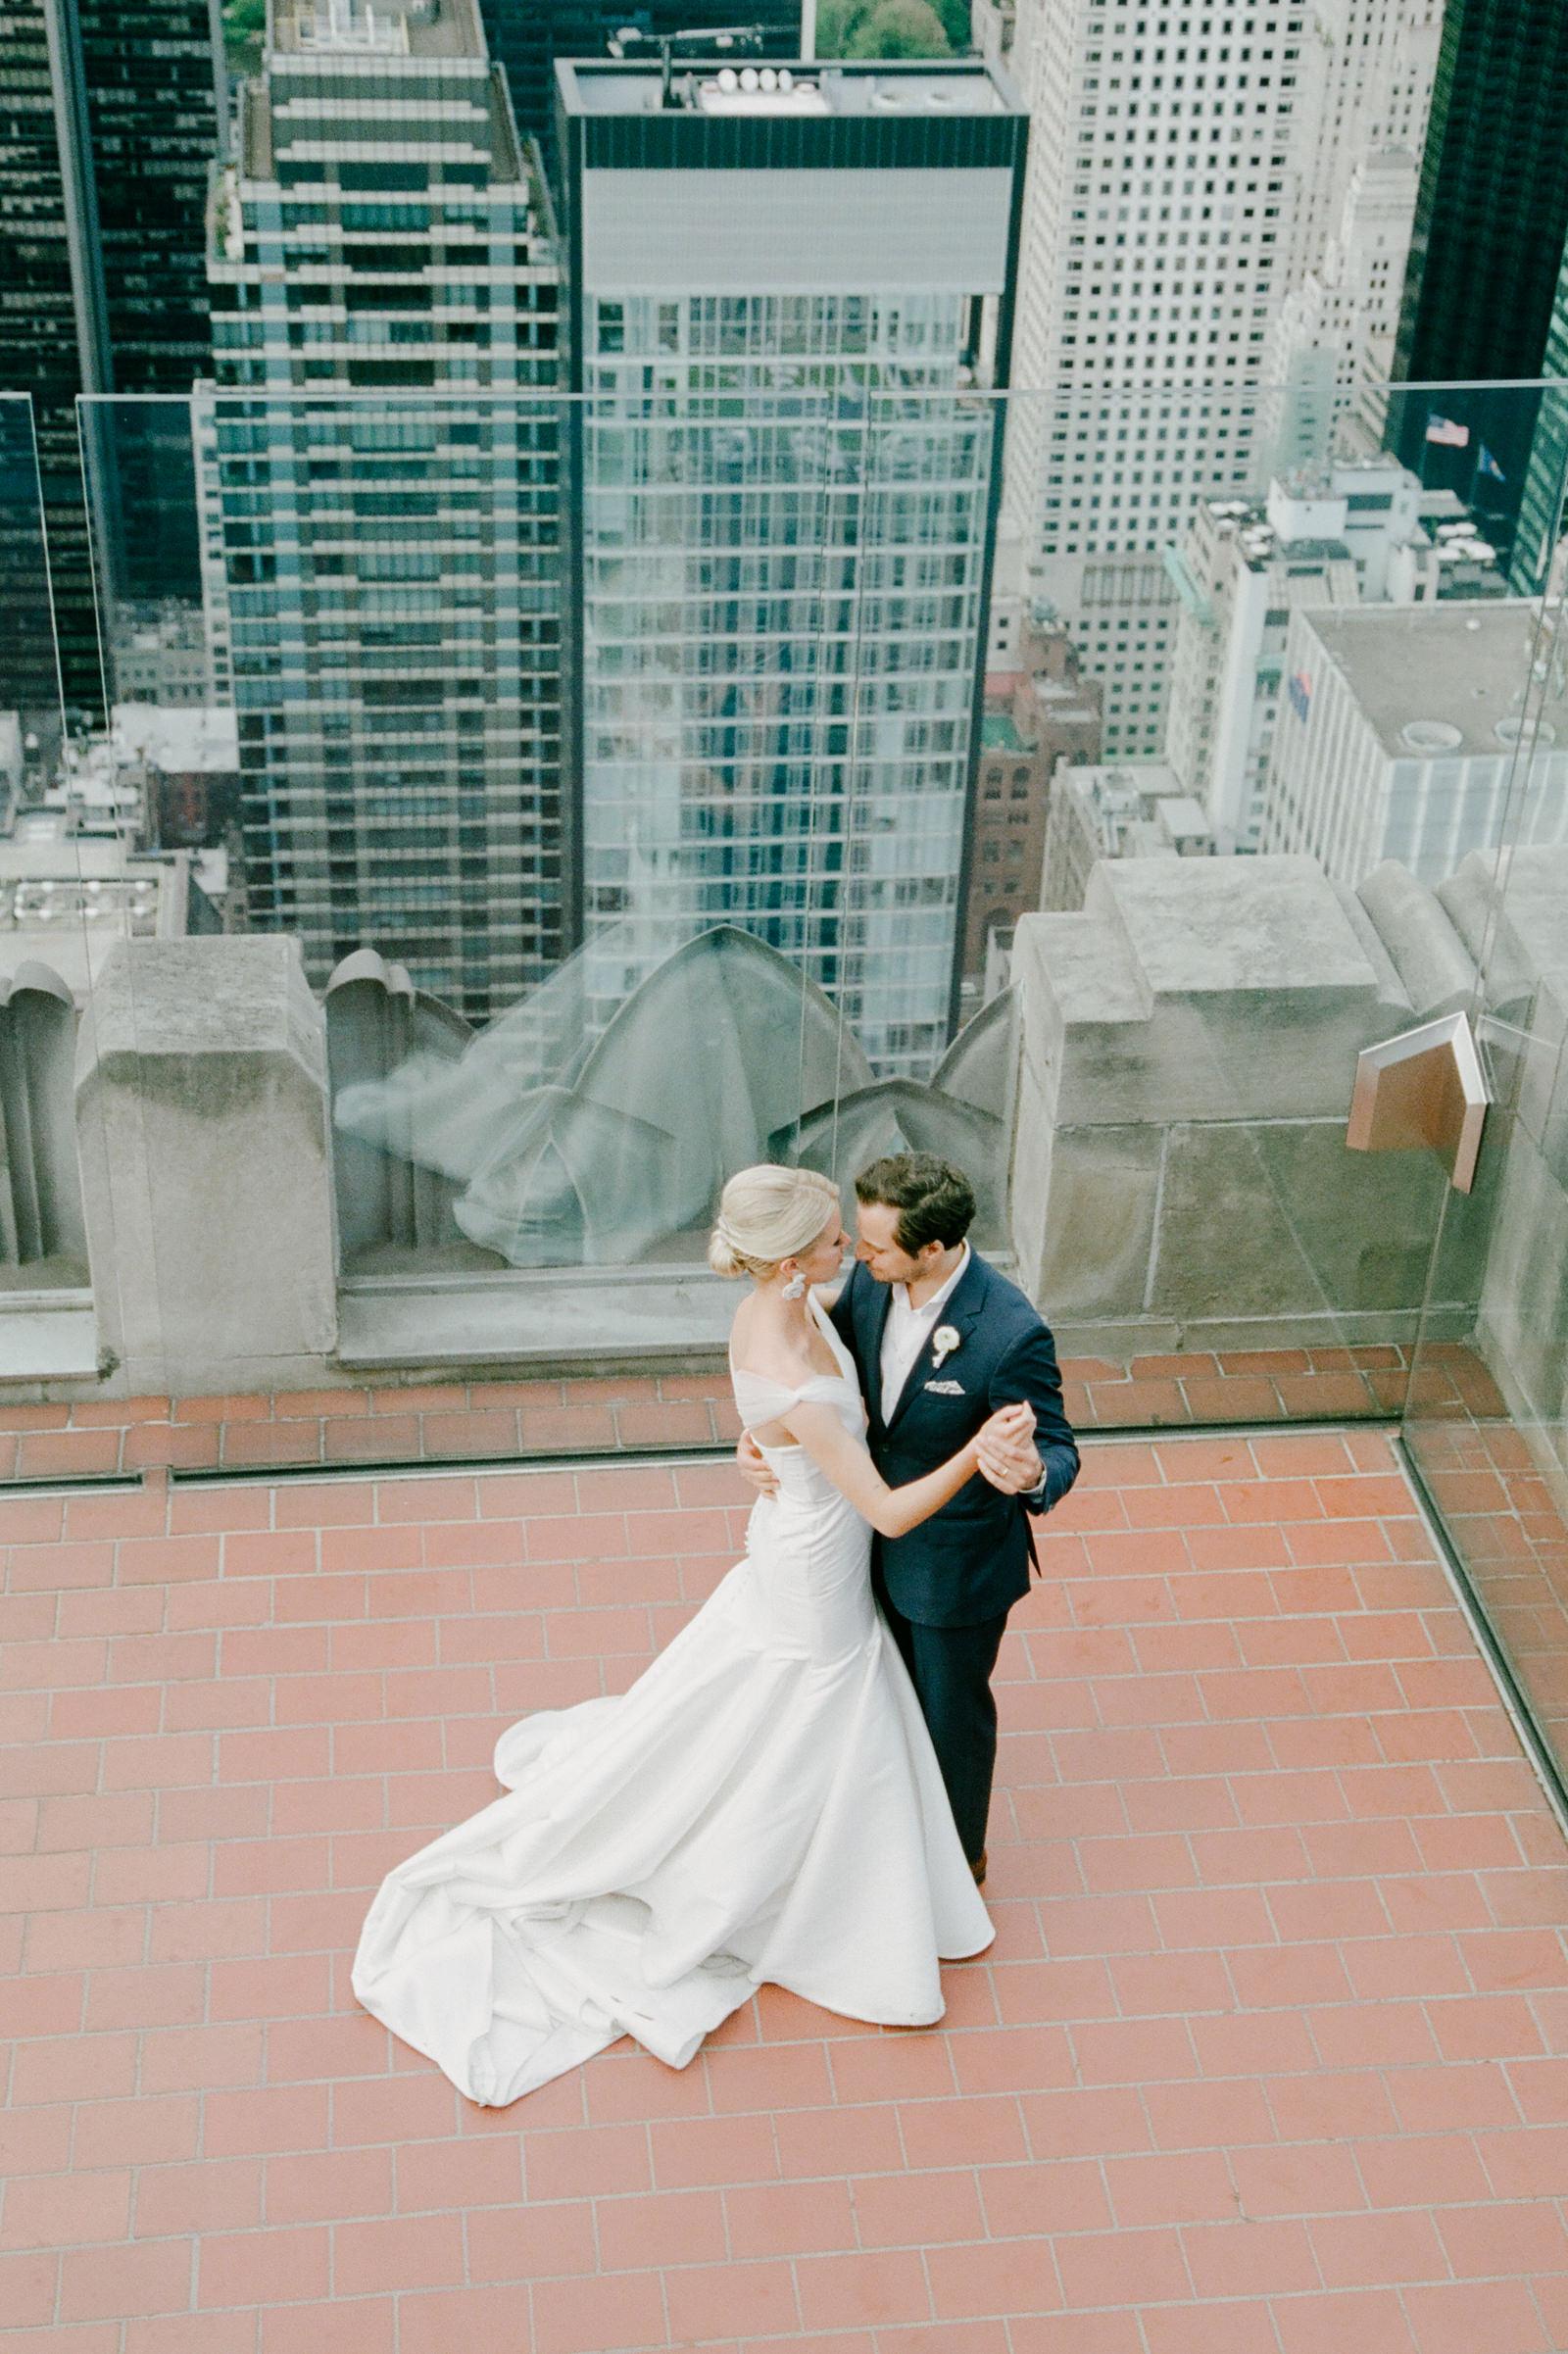 Intimate-NYC_wedding_ by Tanya Isaeva-173.jpg